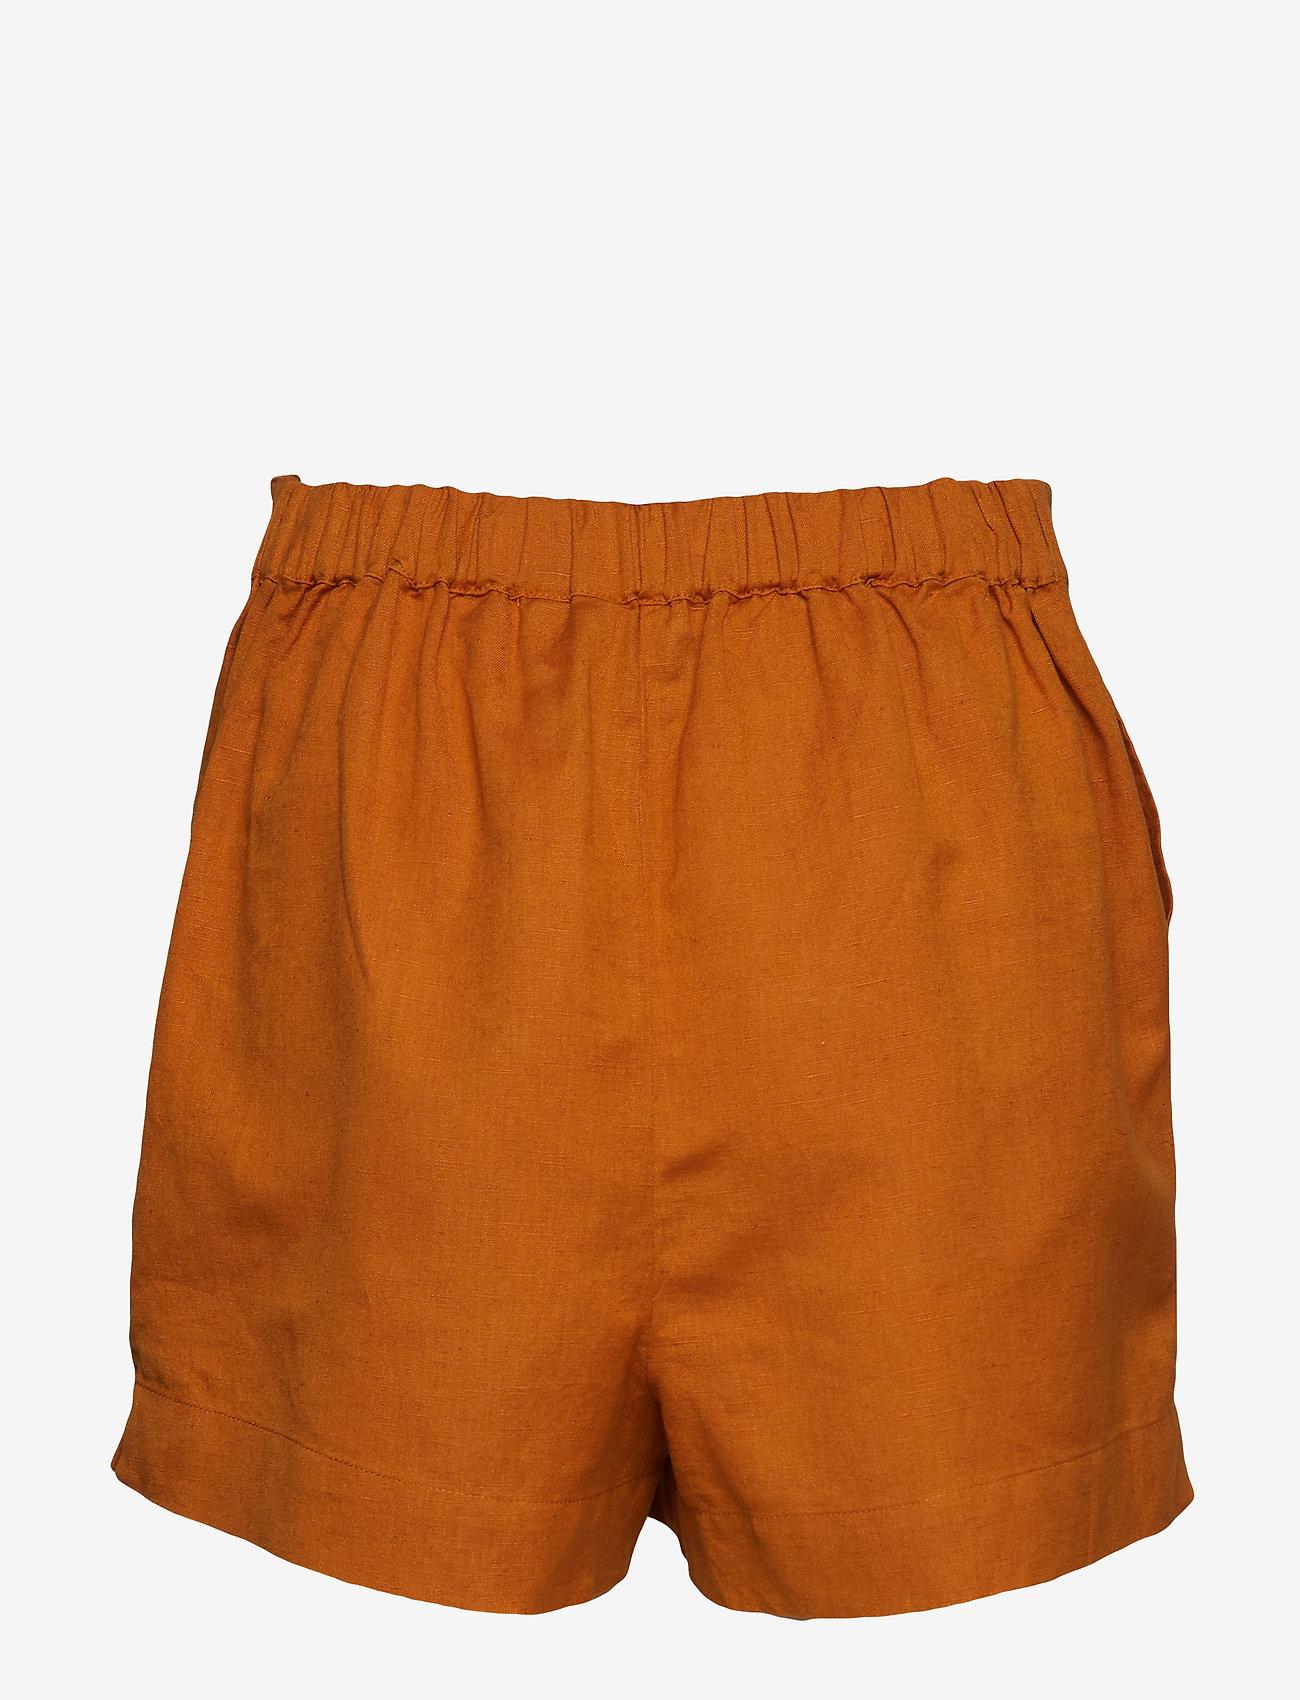 Superdry - MILA CULOTTE SHORTS - shorts casual - ochre - 1